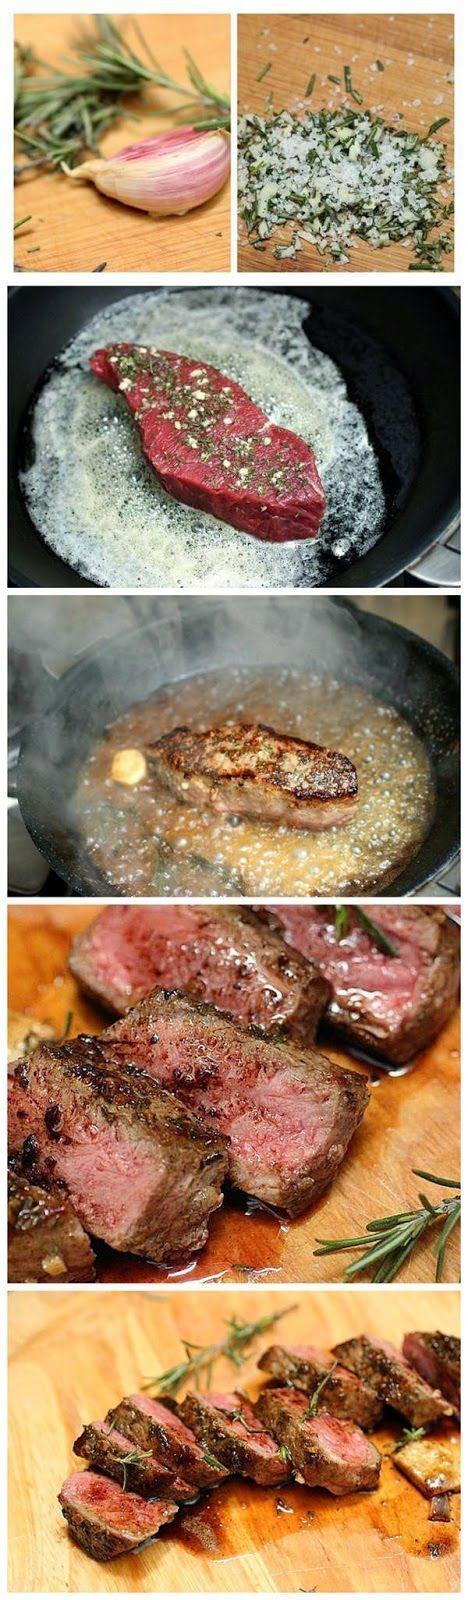 FooF Drink: Recipe For Rosemary Garlic Butter Steaks